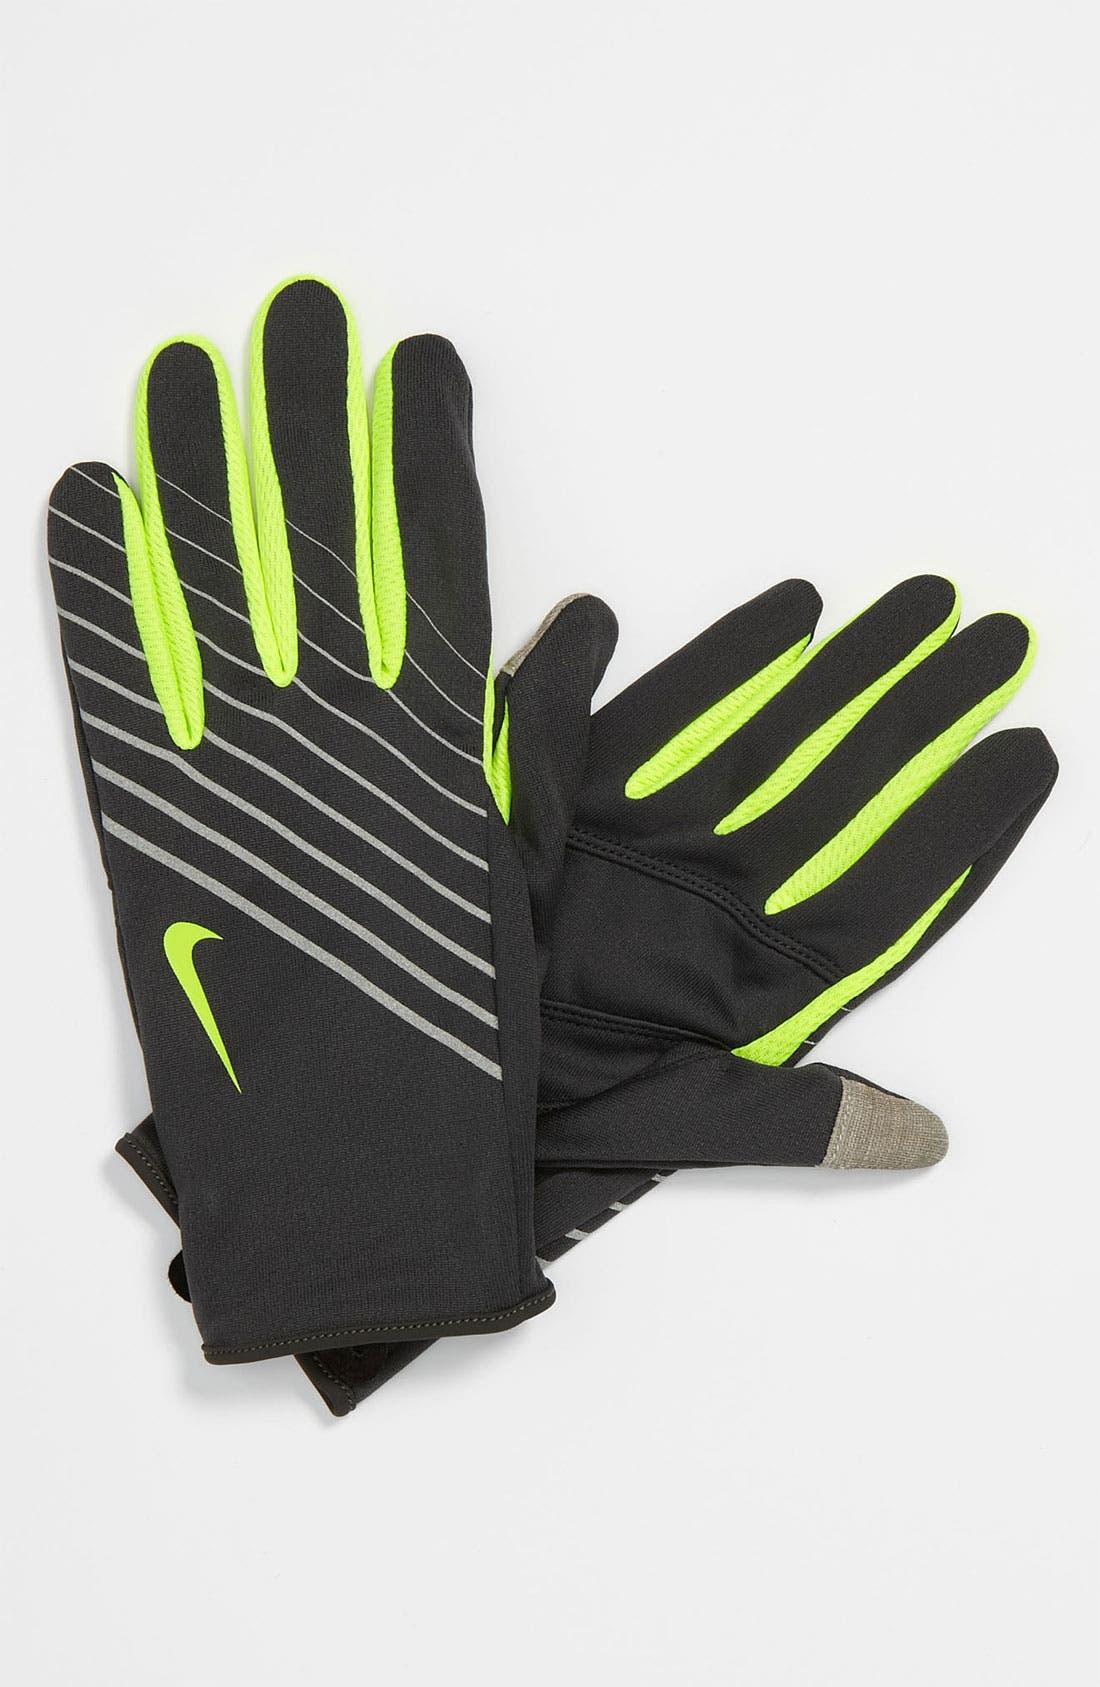 Alternate Image 1 Selected - Nike 'Tech' Lightweight Running Gloves